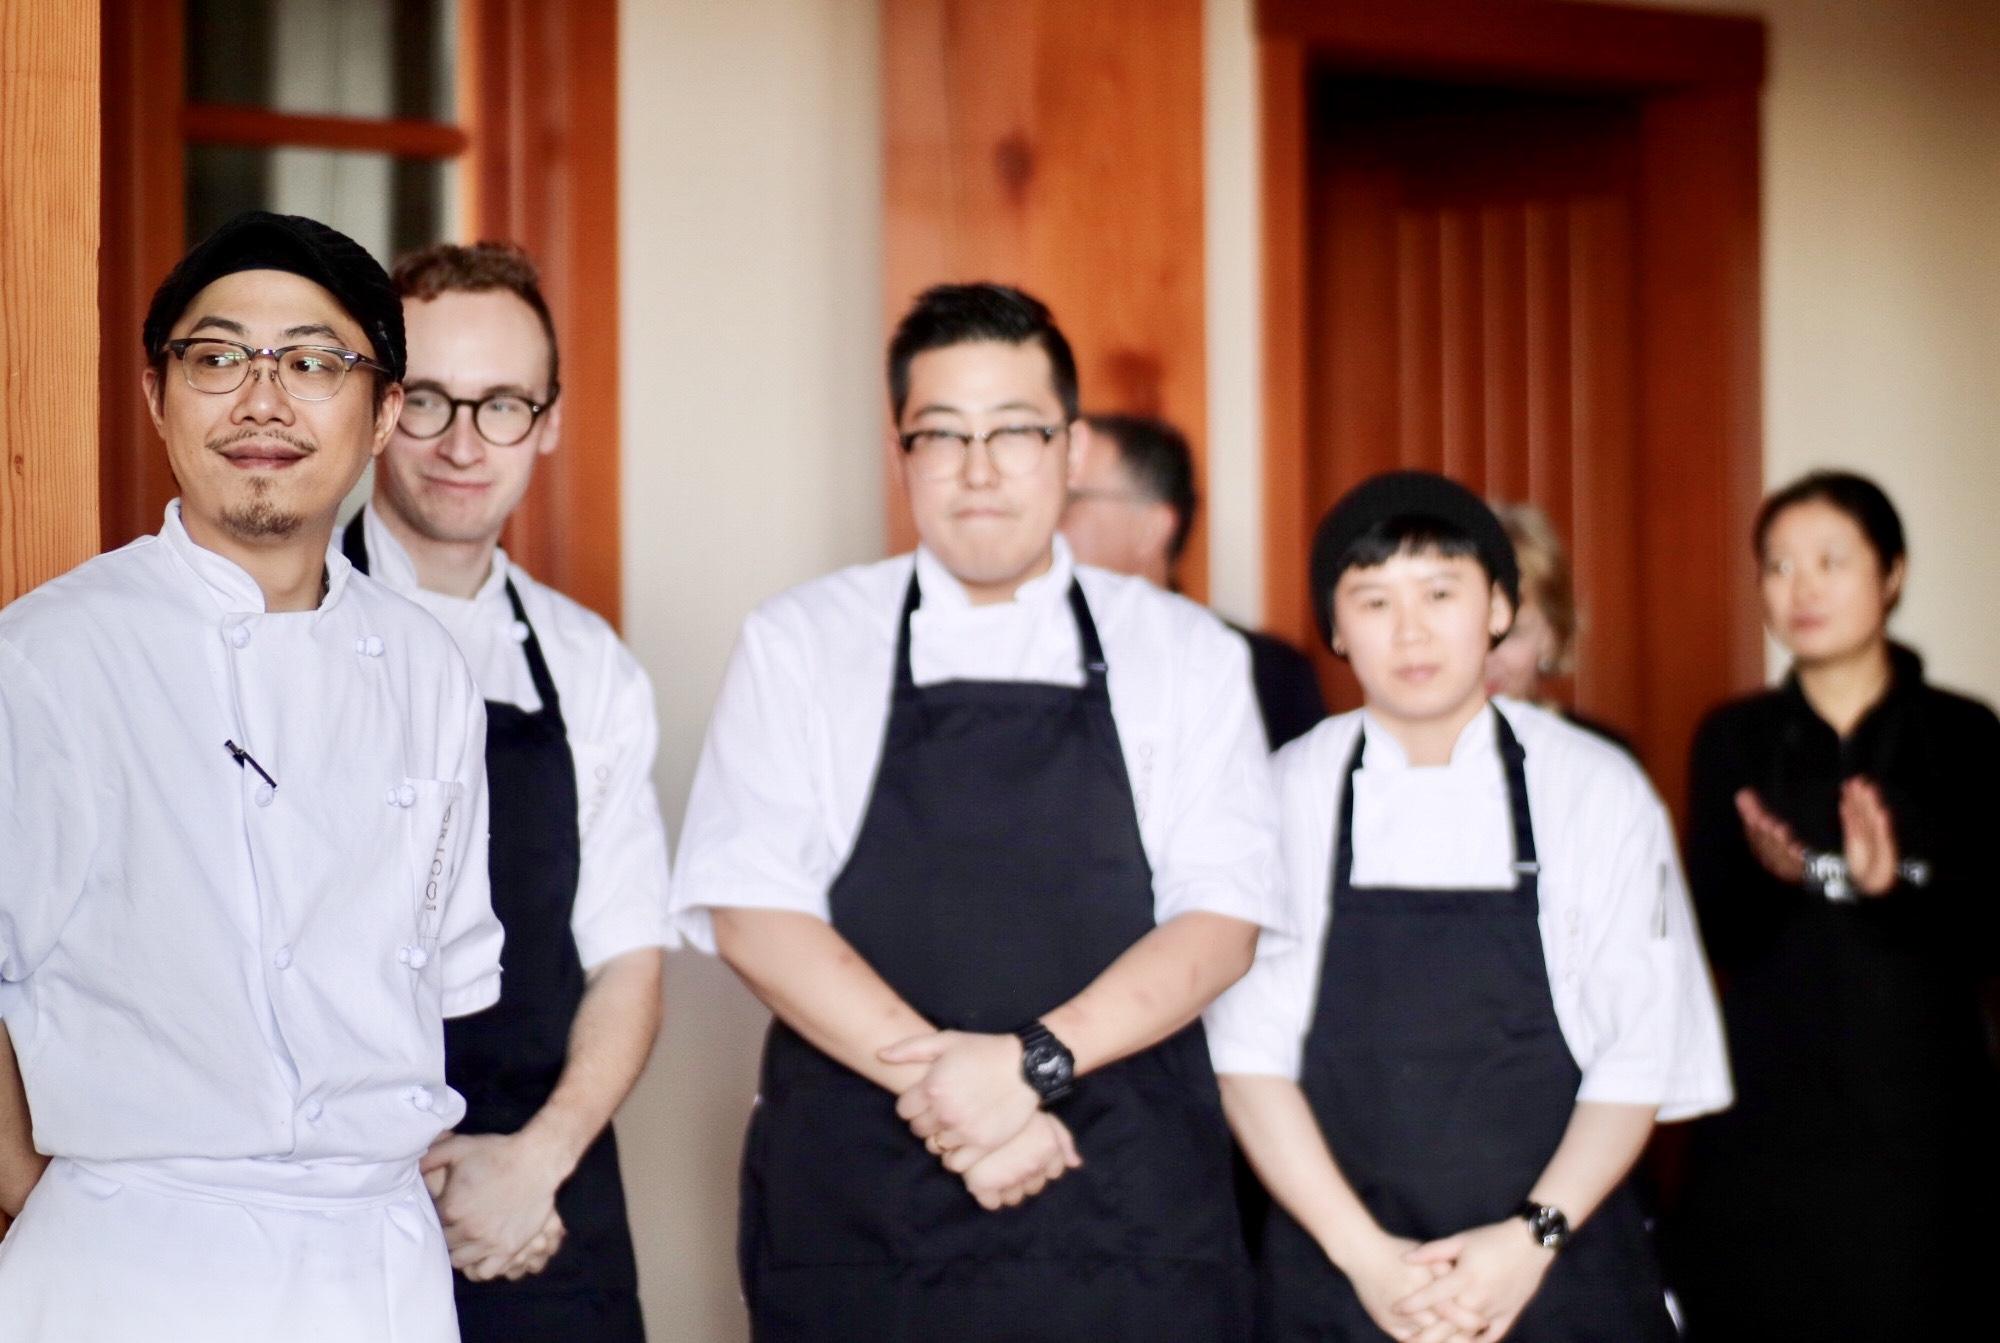 Chef David Pan + team